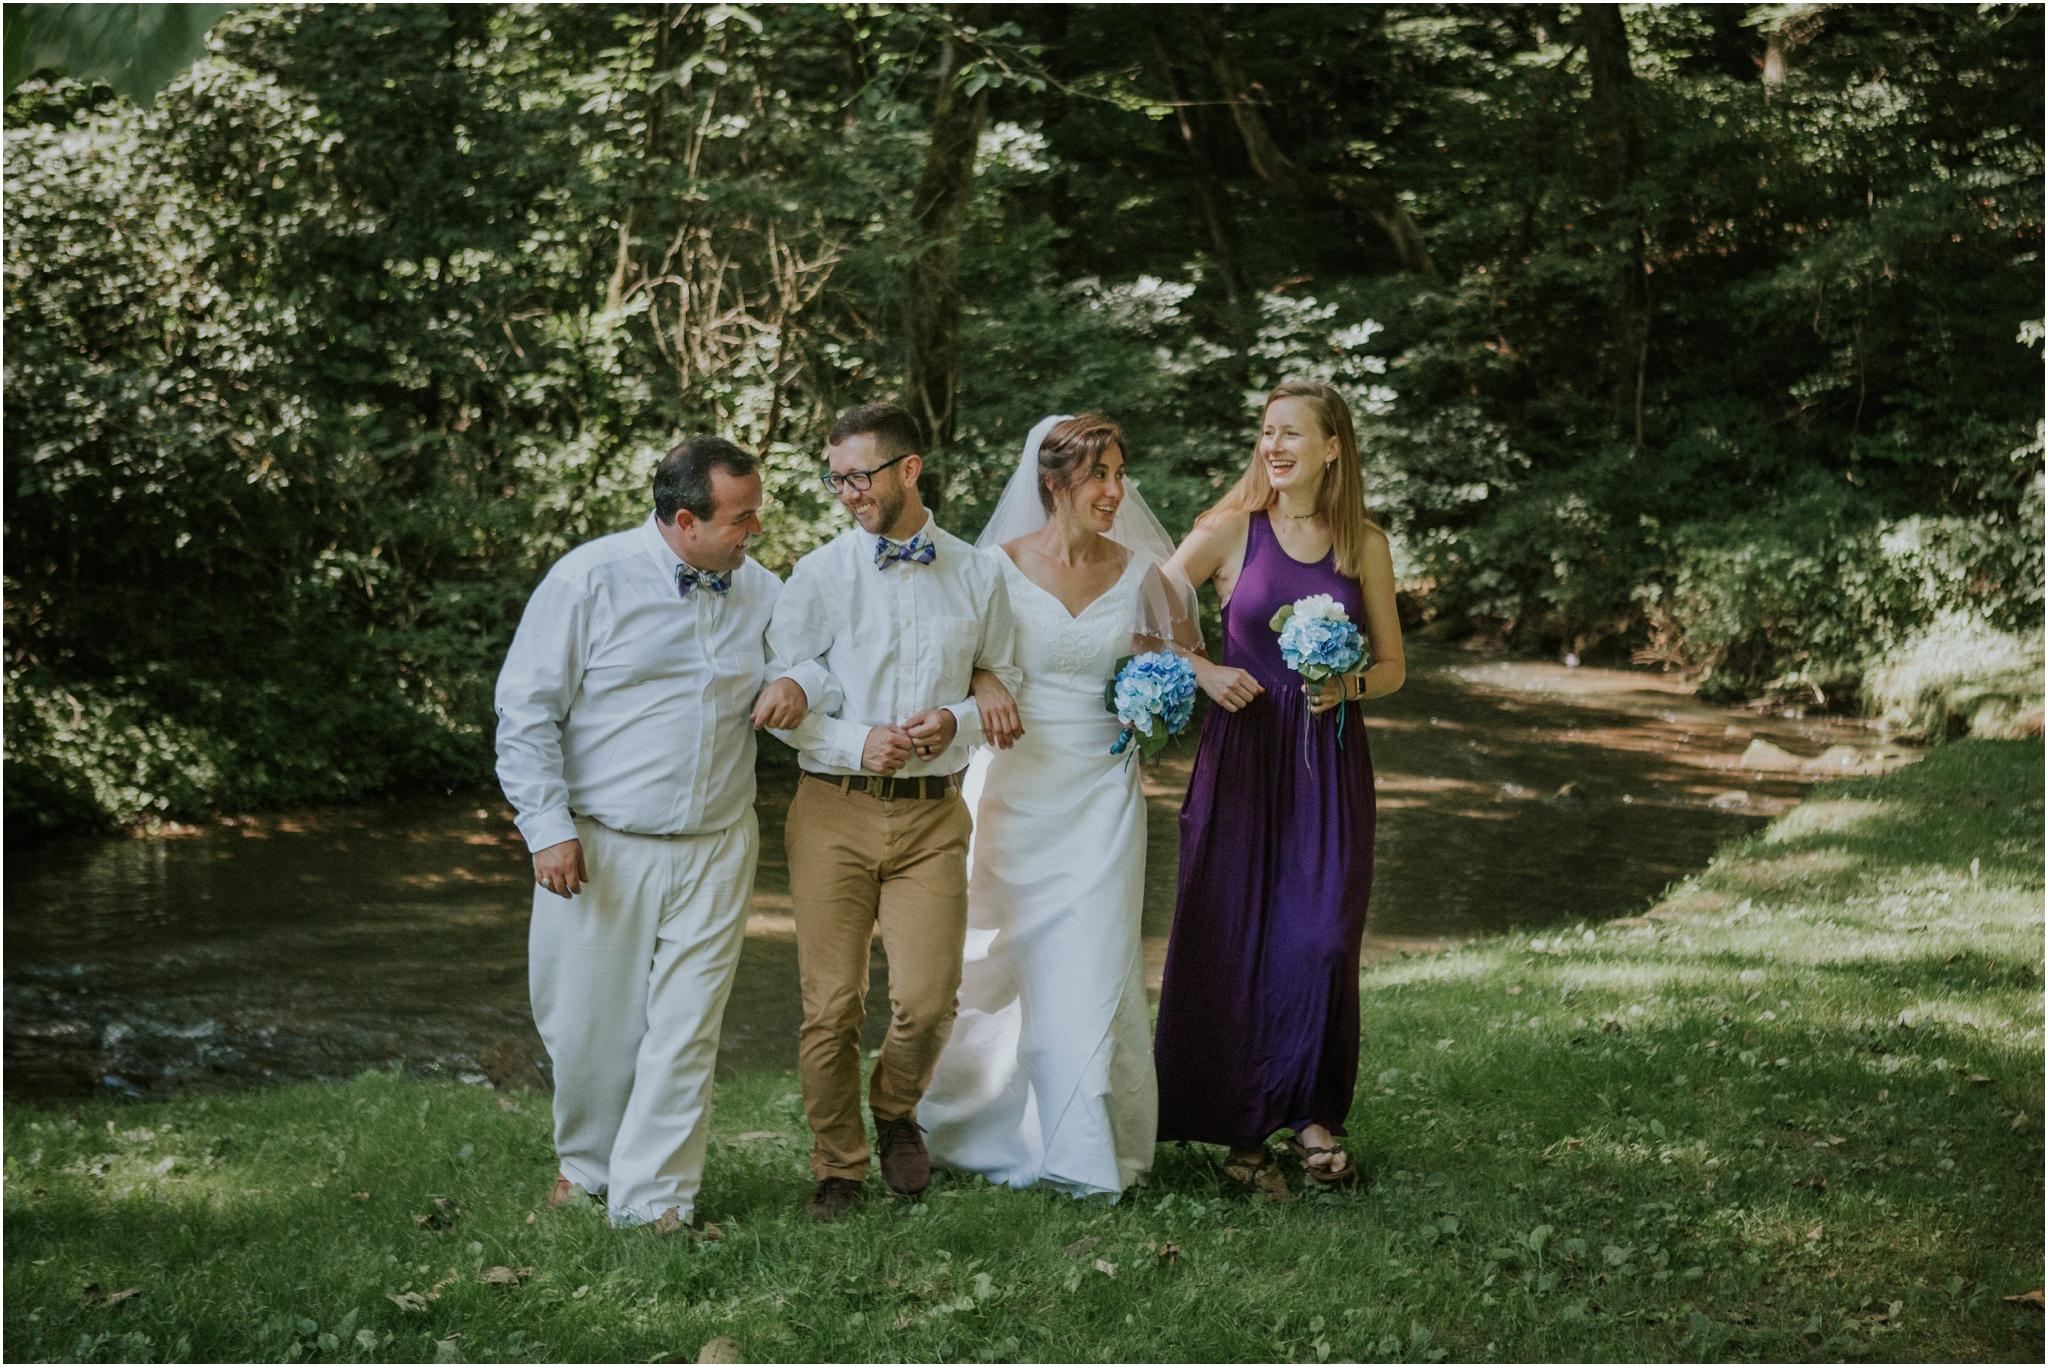 sugar-hollow-park-bristol-virginia-wedding-intimate-woodsy-black-forest-ceremony-adventurous-couple_0036.jpg